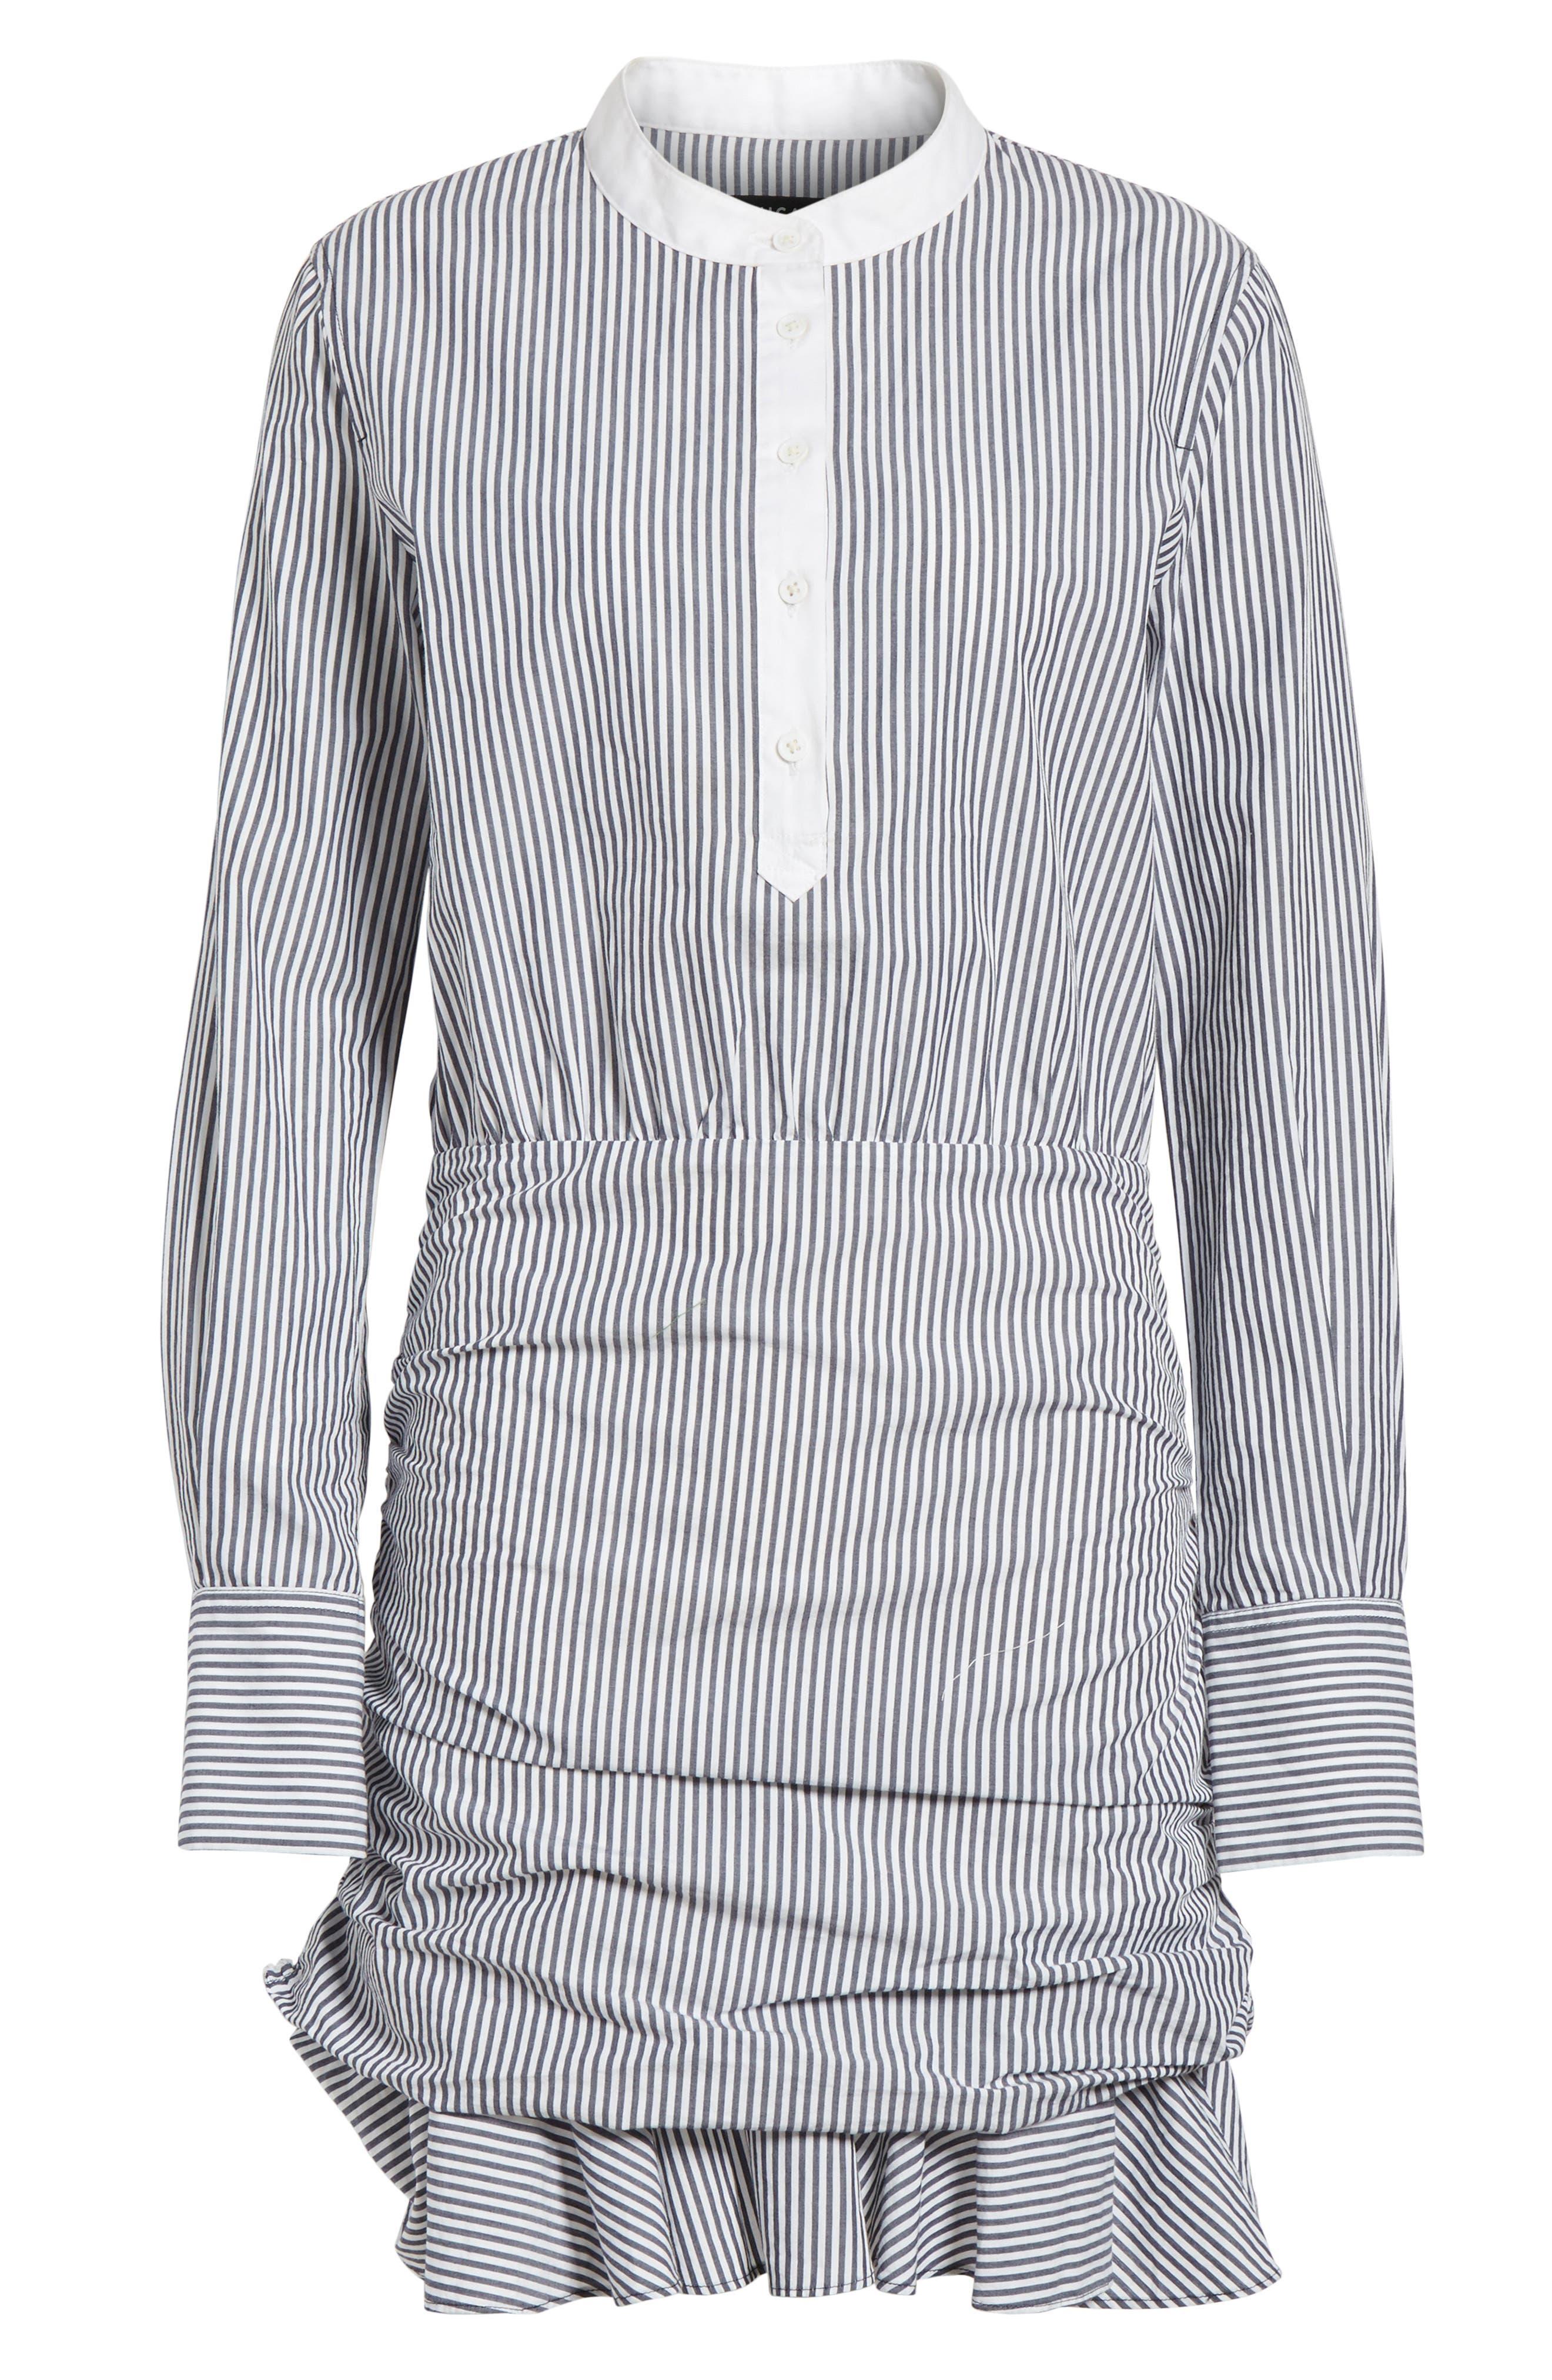 Everett Stripe Shirtdress,                             Alternate thumbnail 6, color,                             Black/ White Stripe